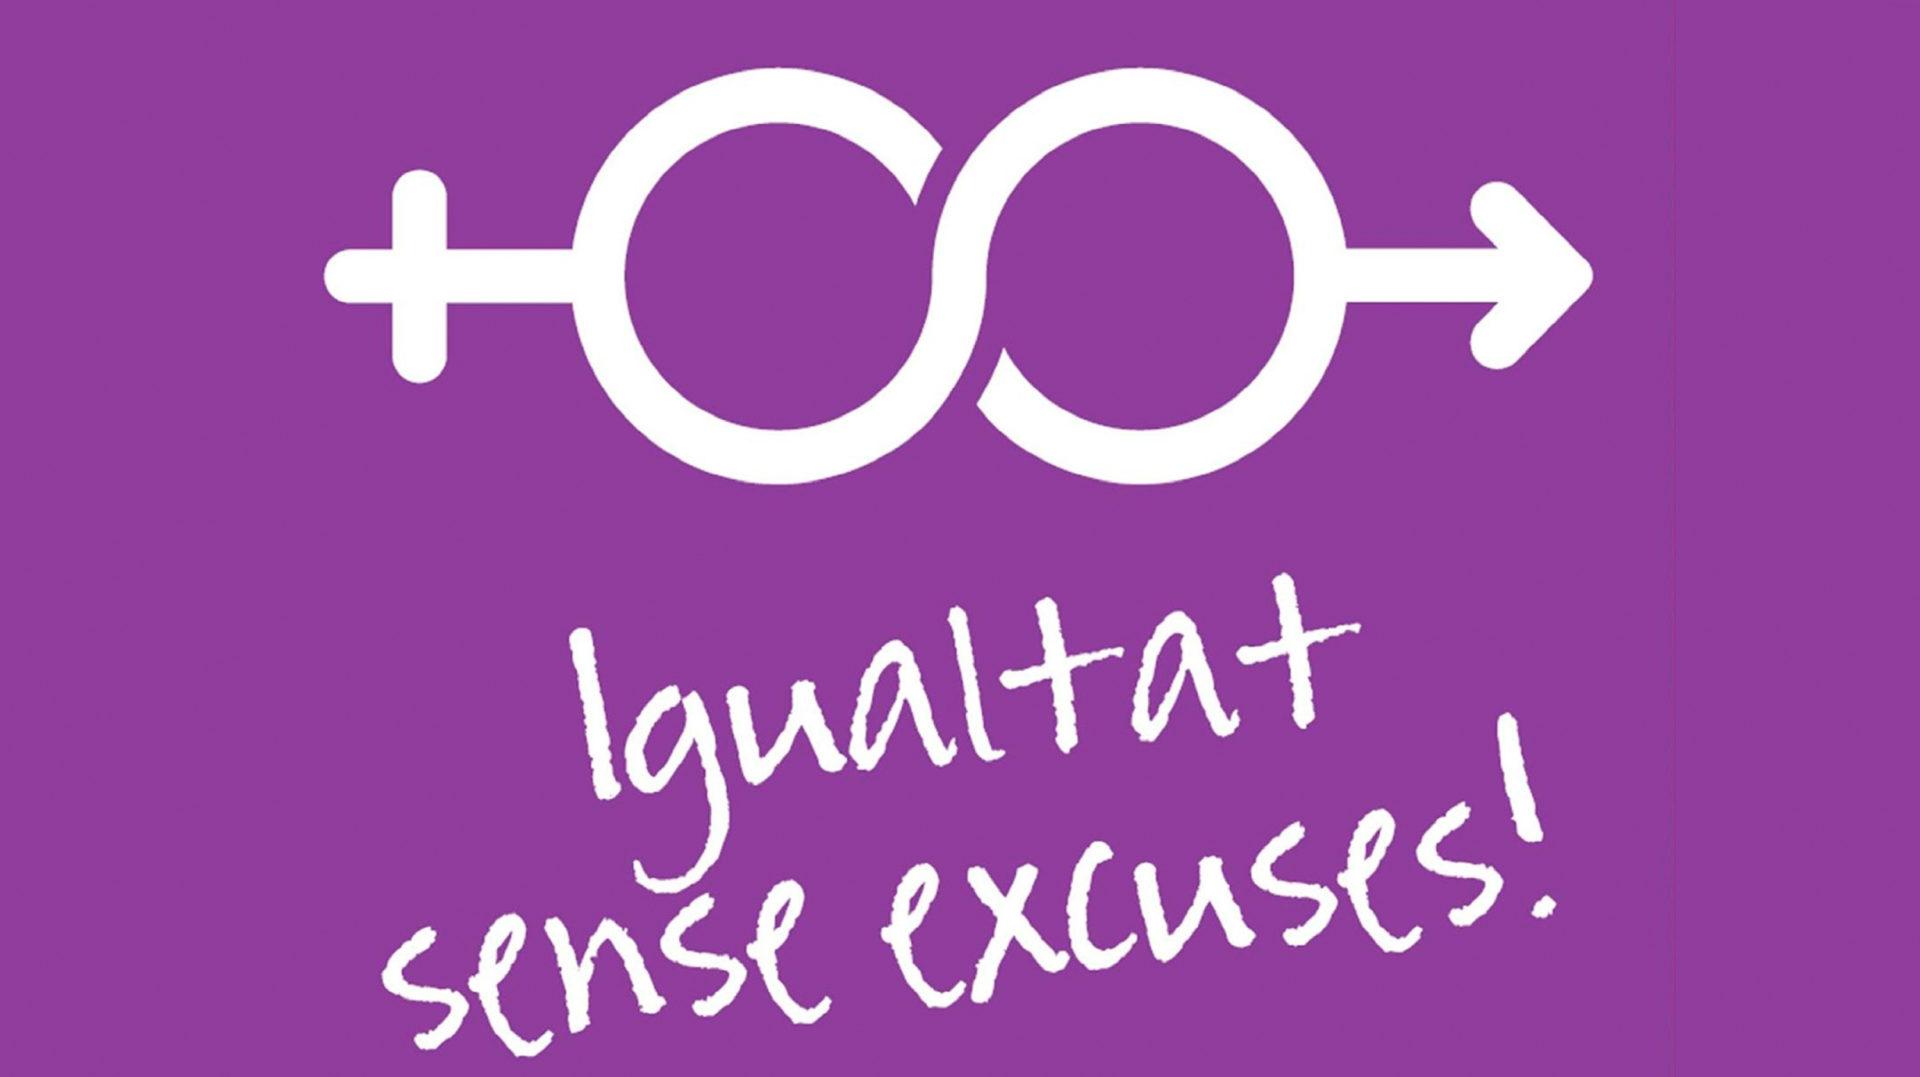 Taula rodona: Igualtat sense excuses!